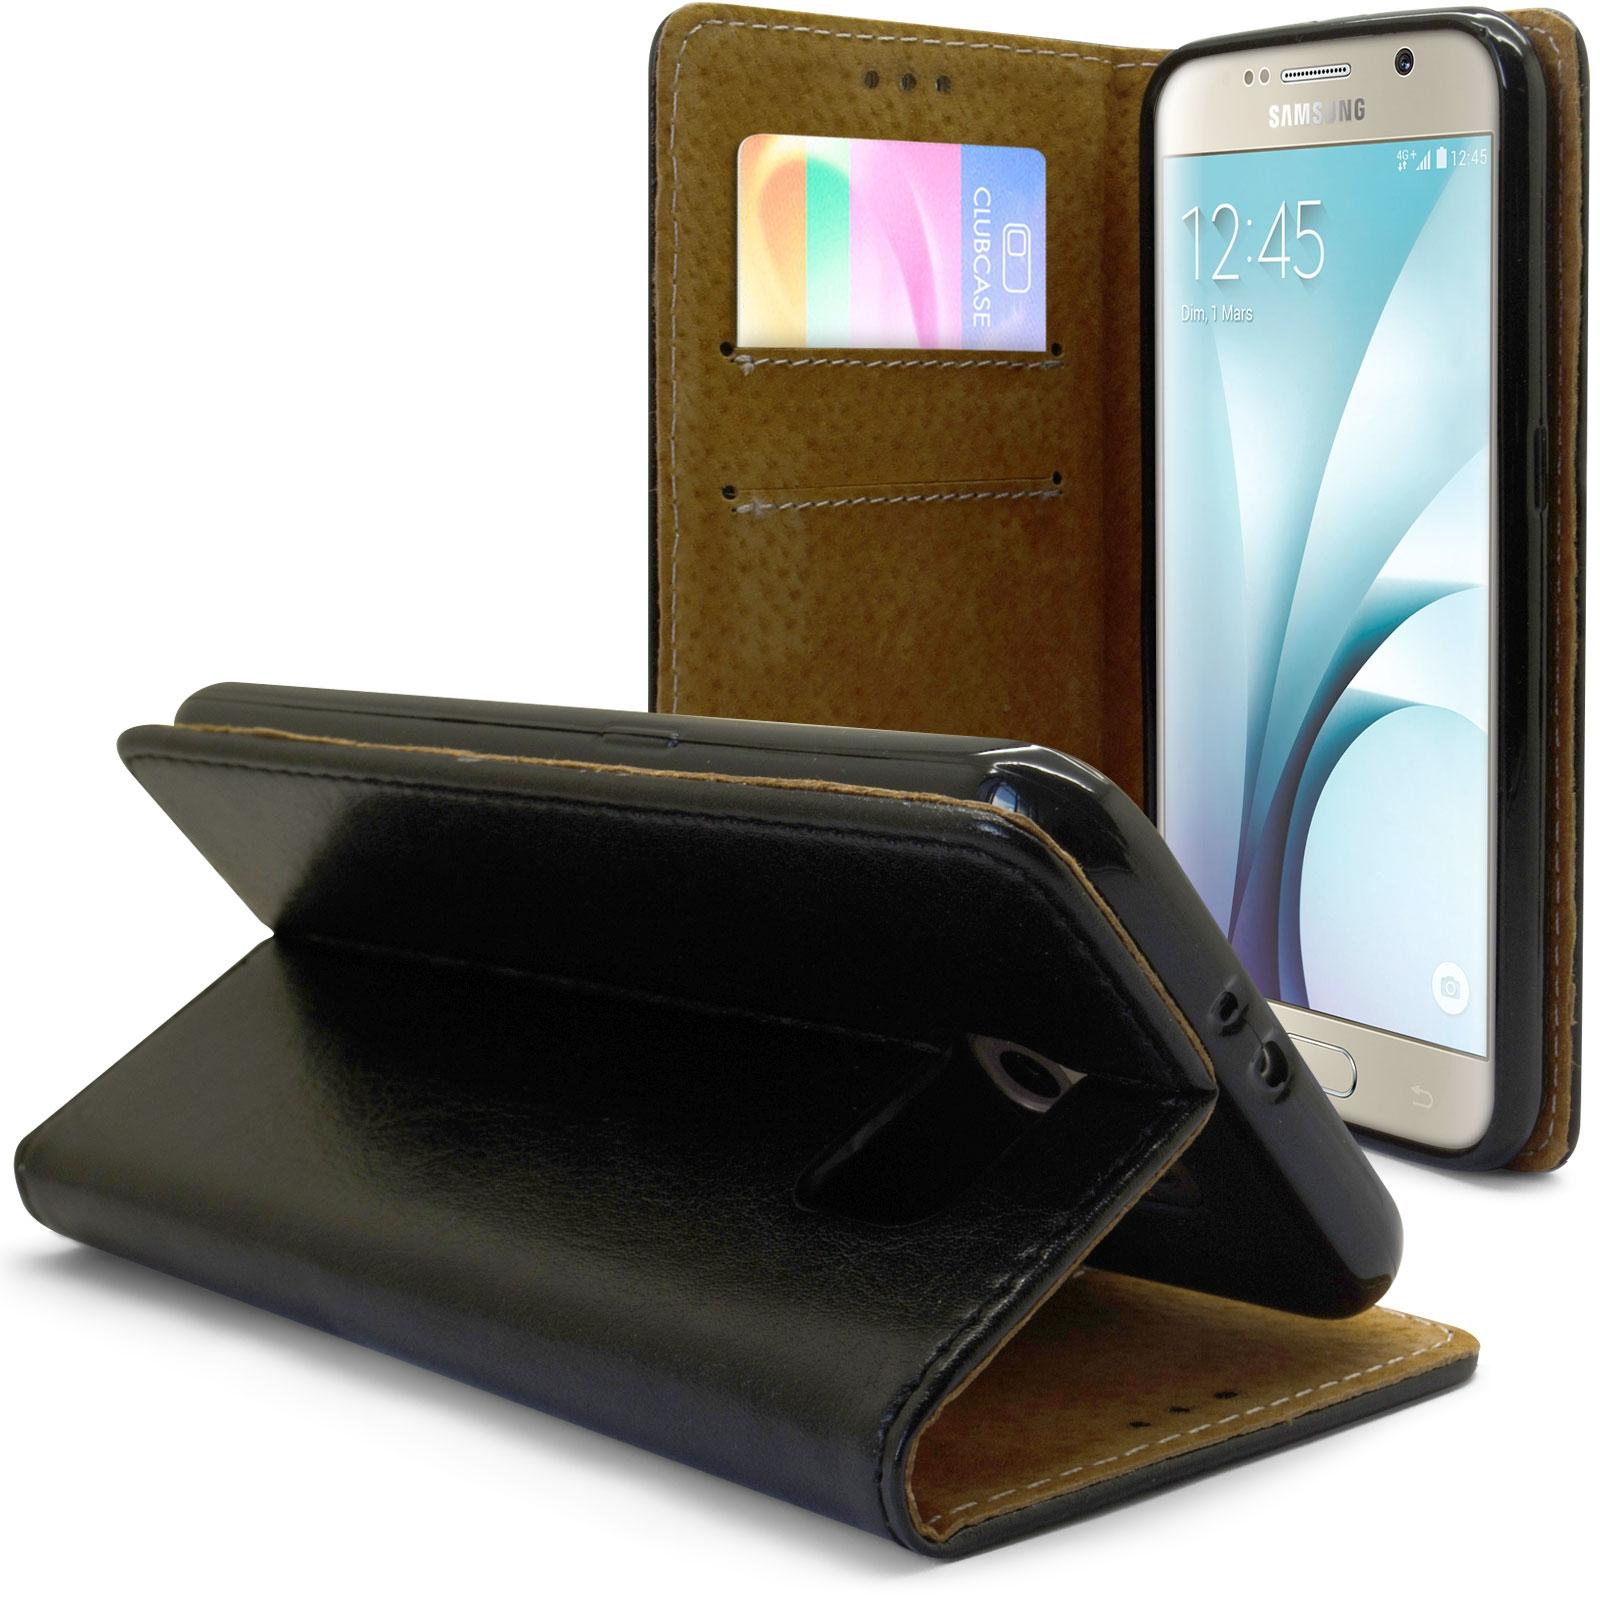 Coque Folio Stand Souple Galaxy S6 Cuir Véritable Noir